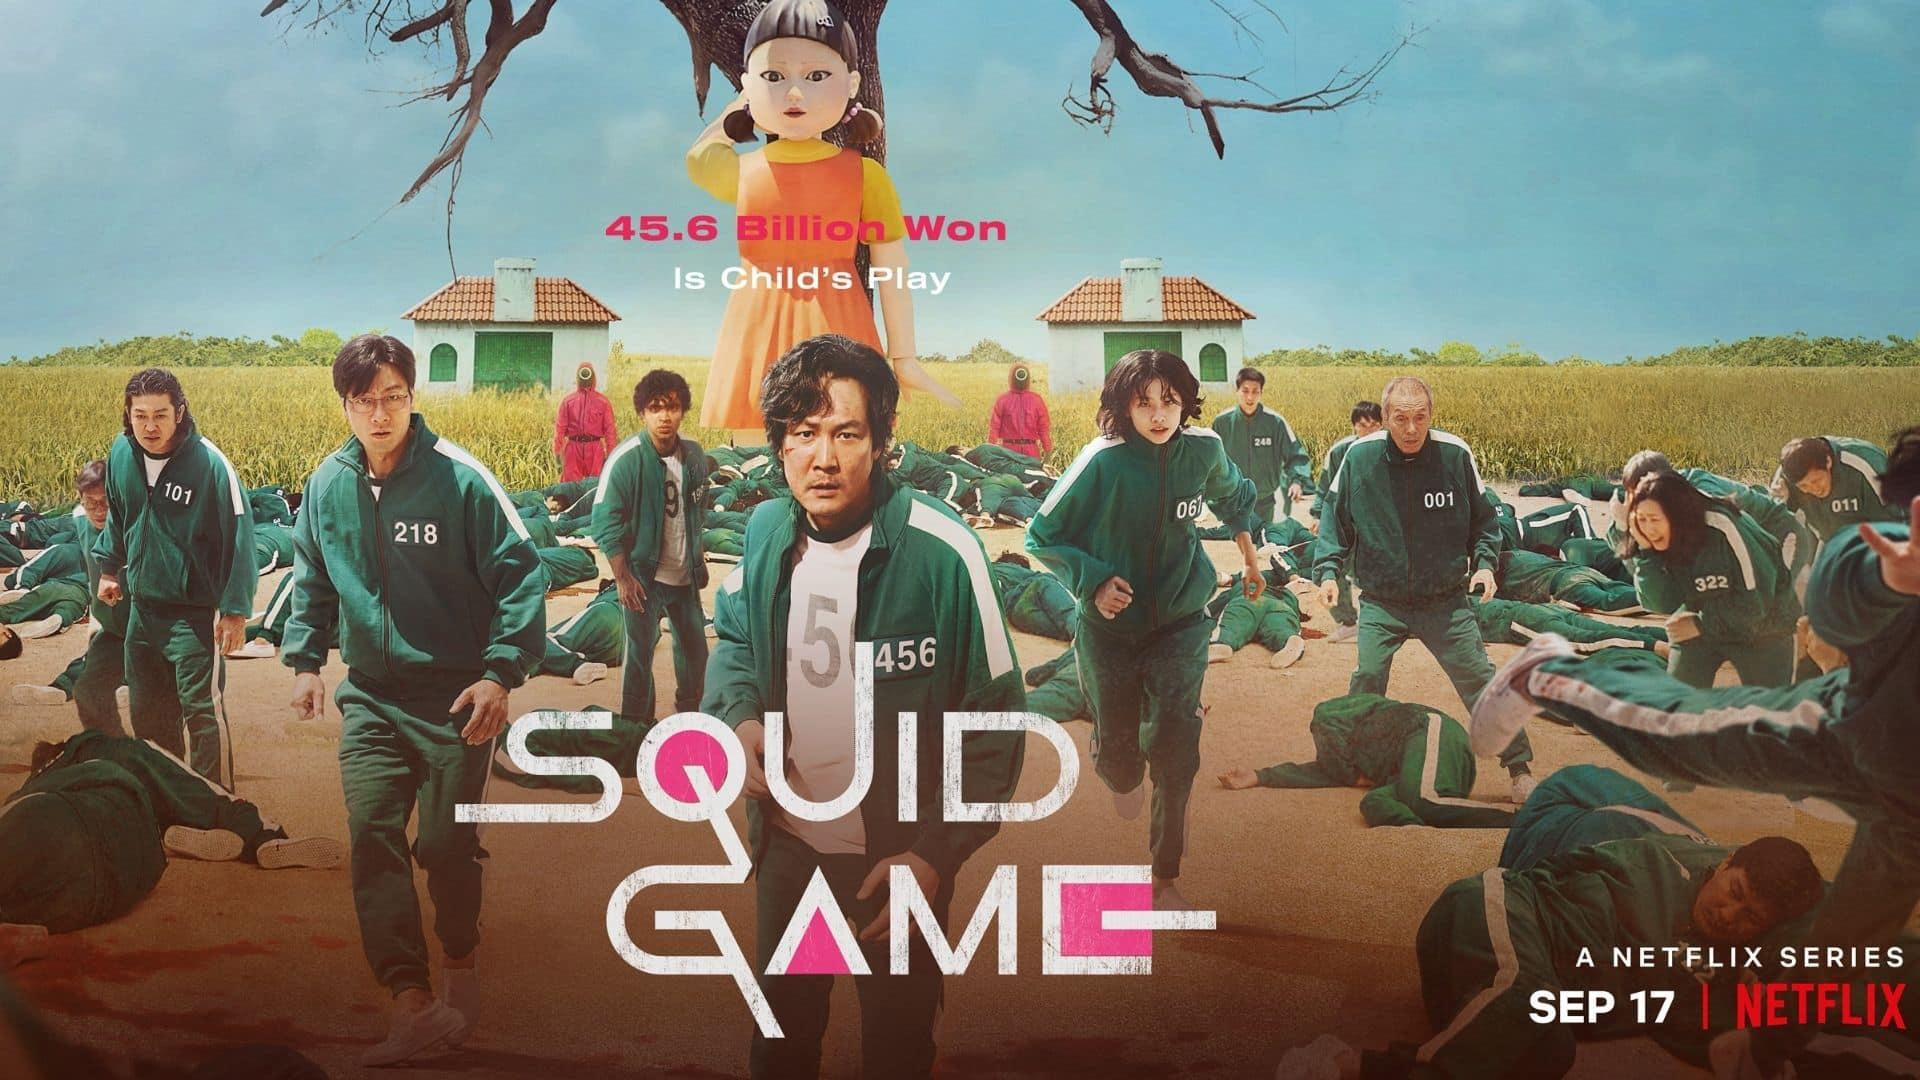 Squid Game: The Worldwide Box Office Hit Netflix Needed